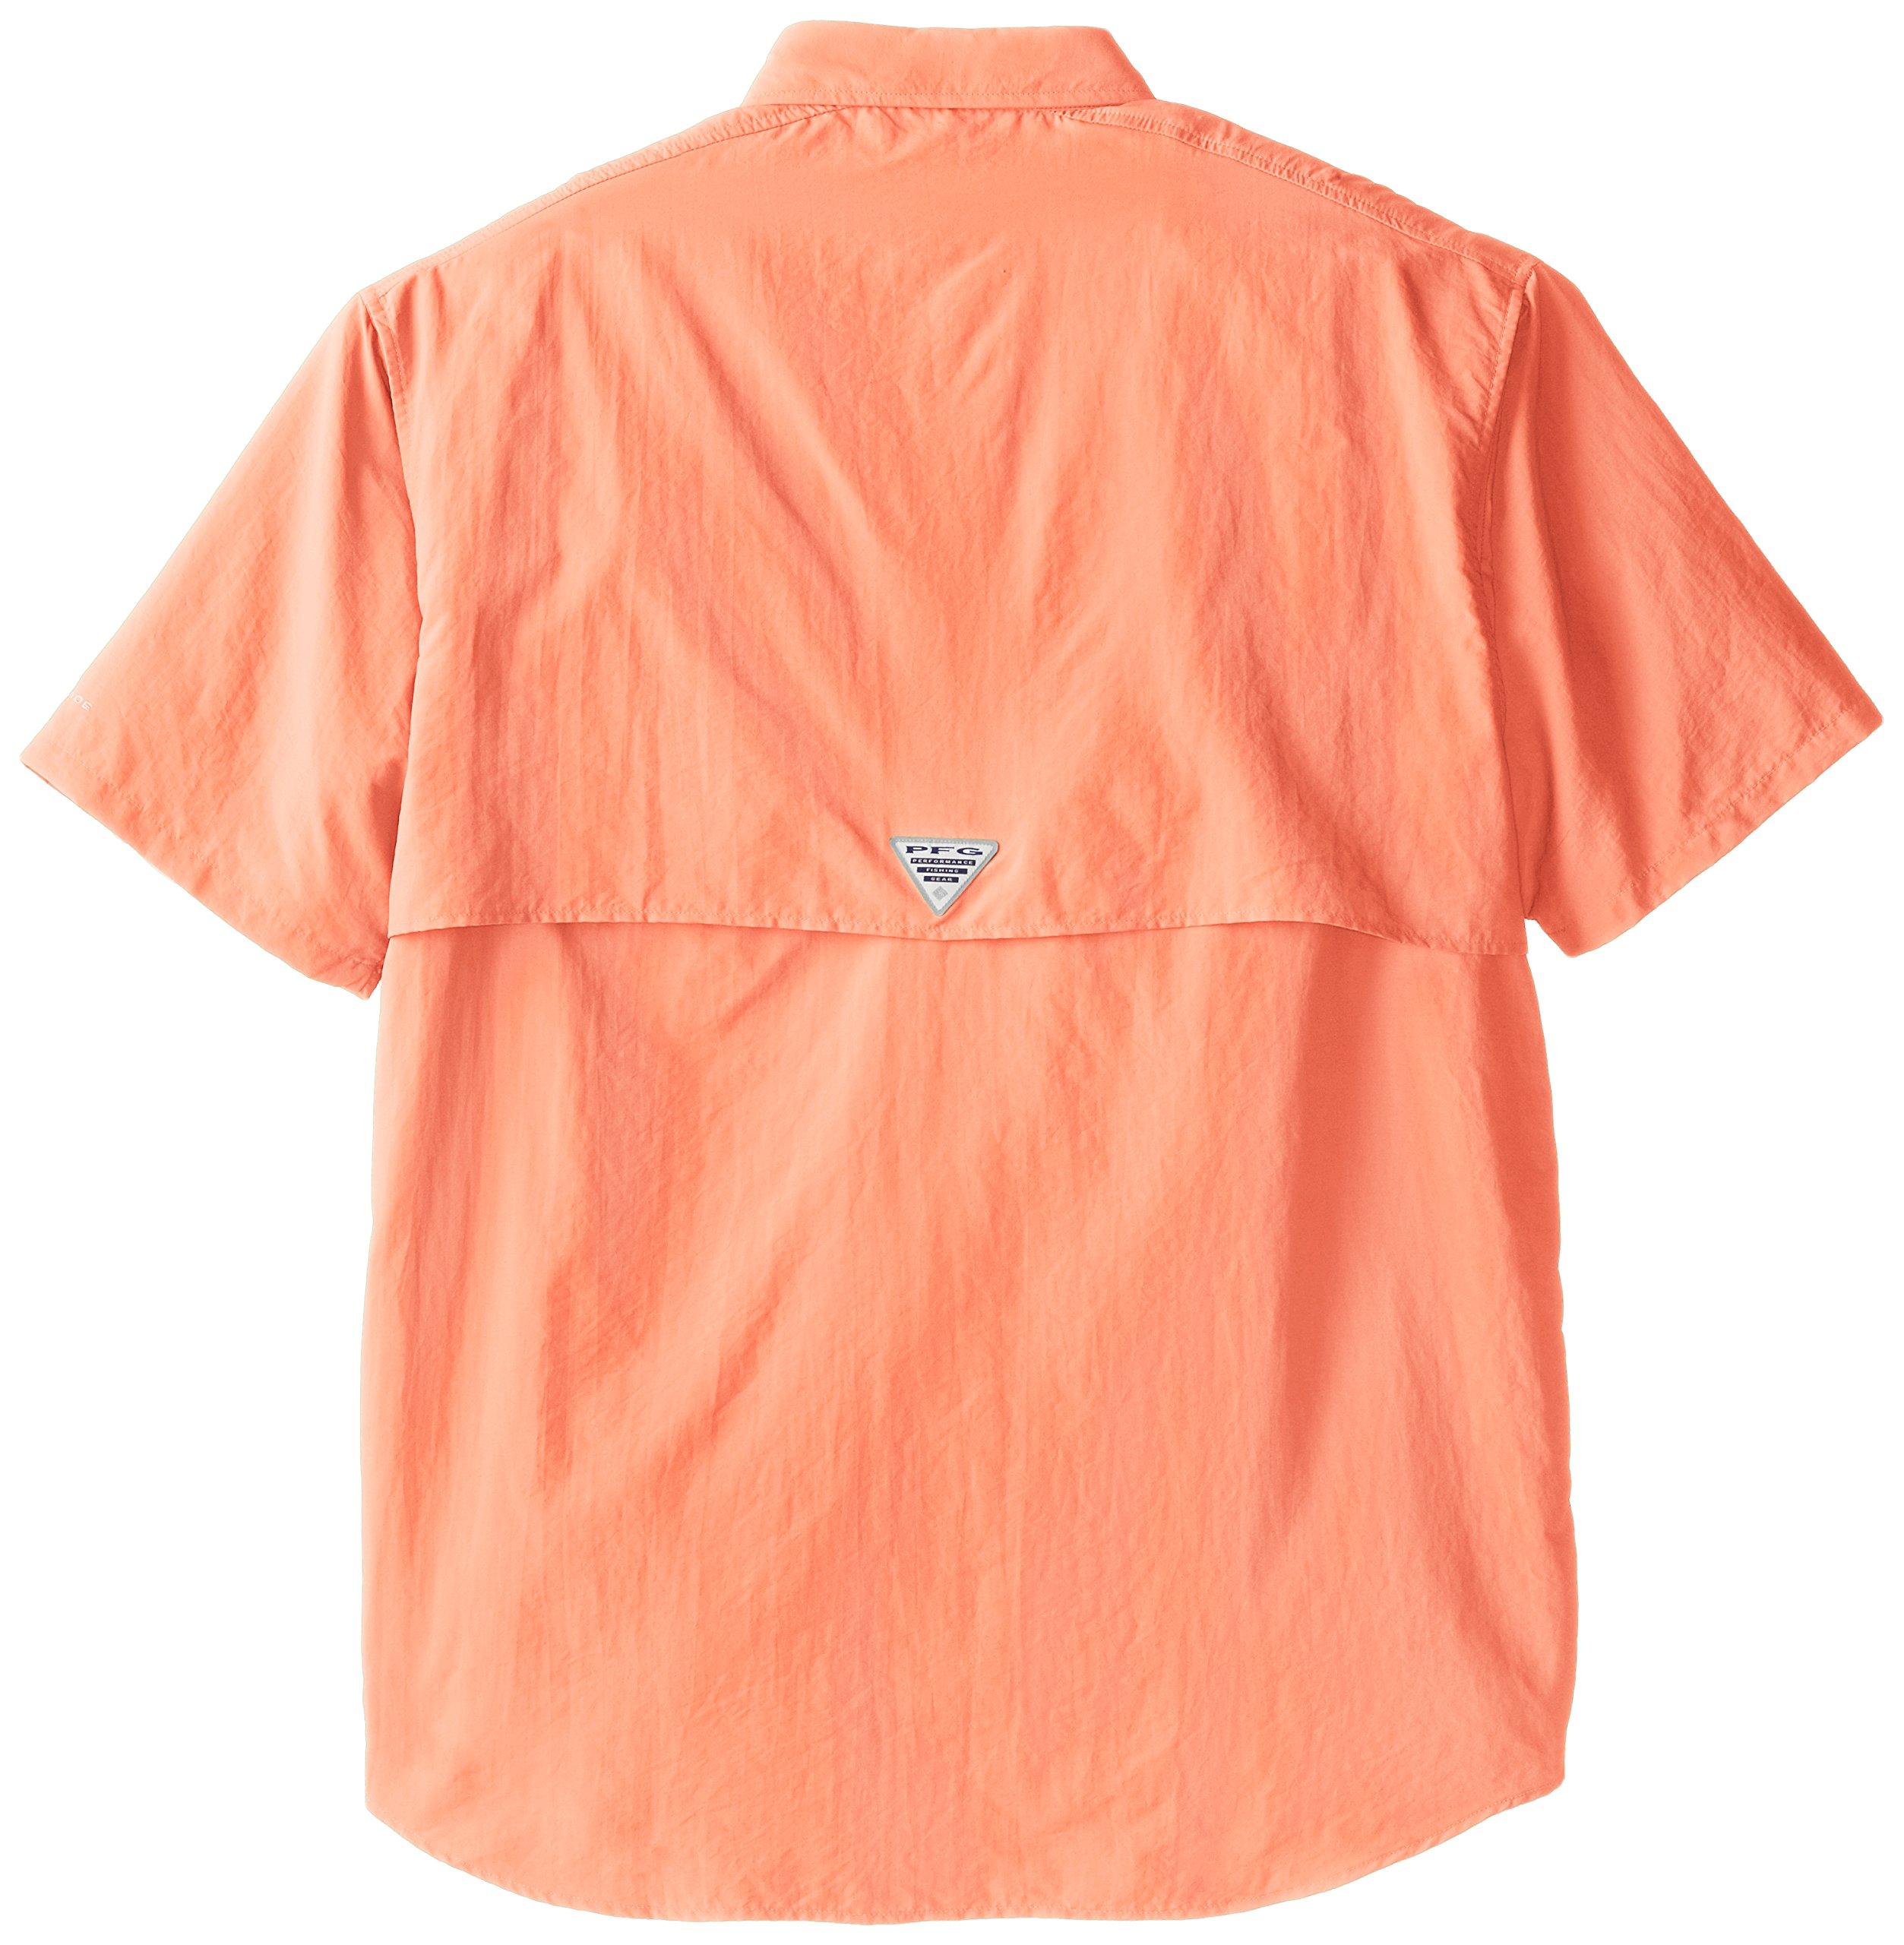 Columbia-Men-039-s-PFG-Bahama-II-Short-Sleeve-Shirt-T-Choose-SZ-color thumbnail 19